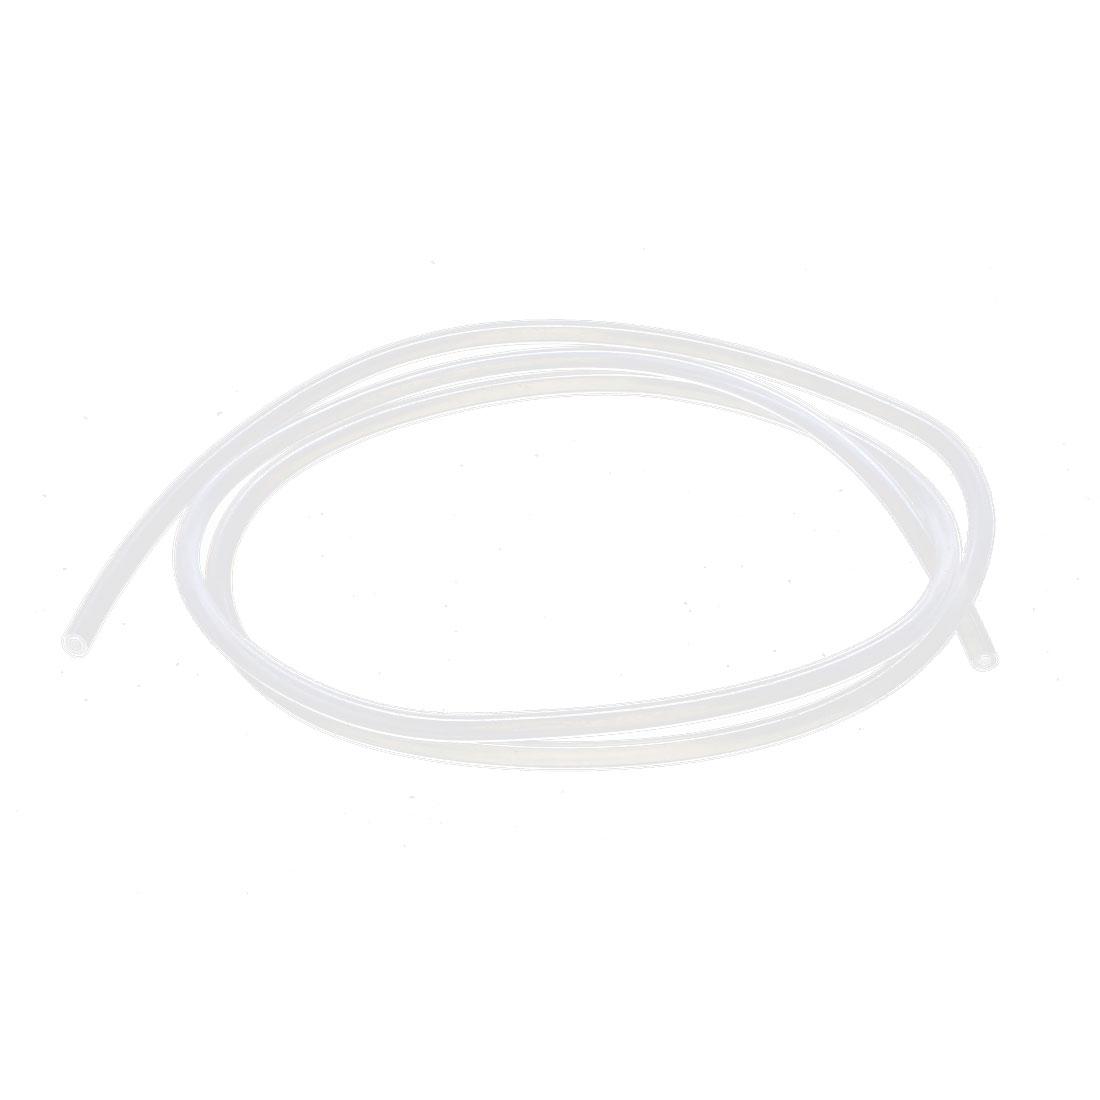 2mm x 4mm PTFE Tubing Tube Pipe 1 Meter 3.3Ft Clear for 3D Printer RepRap